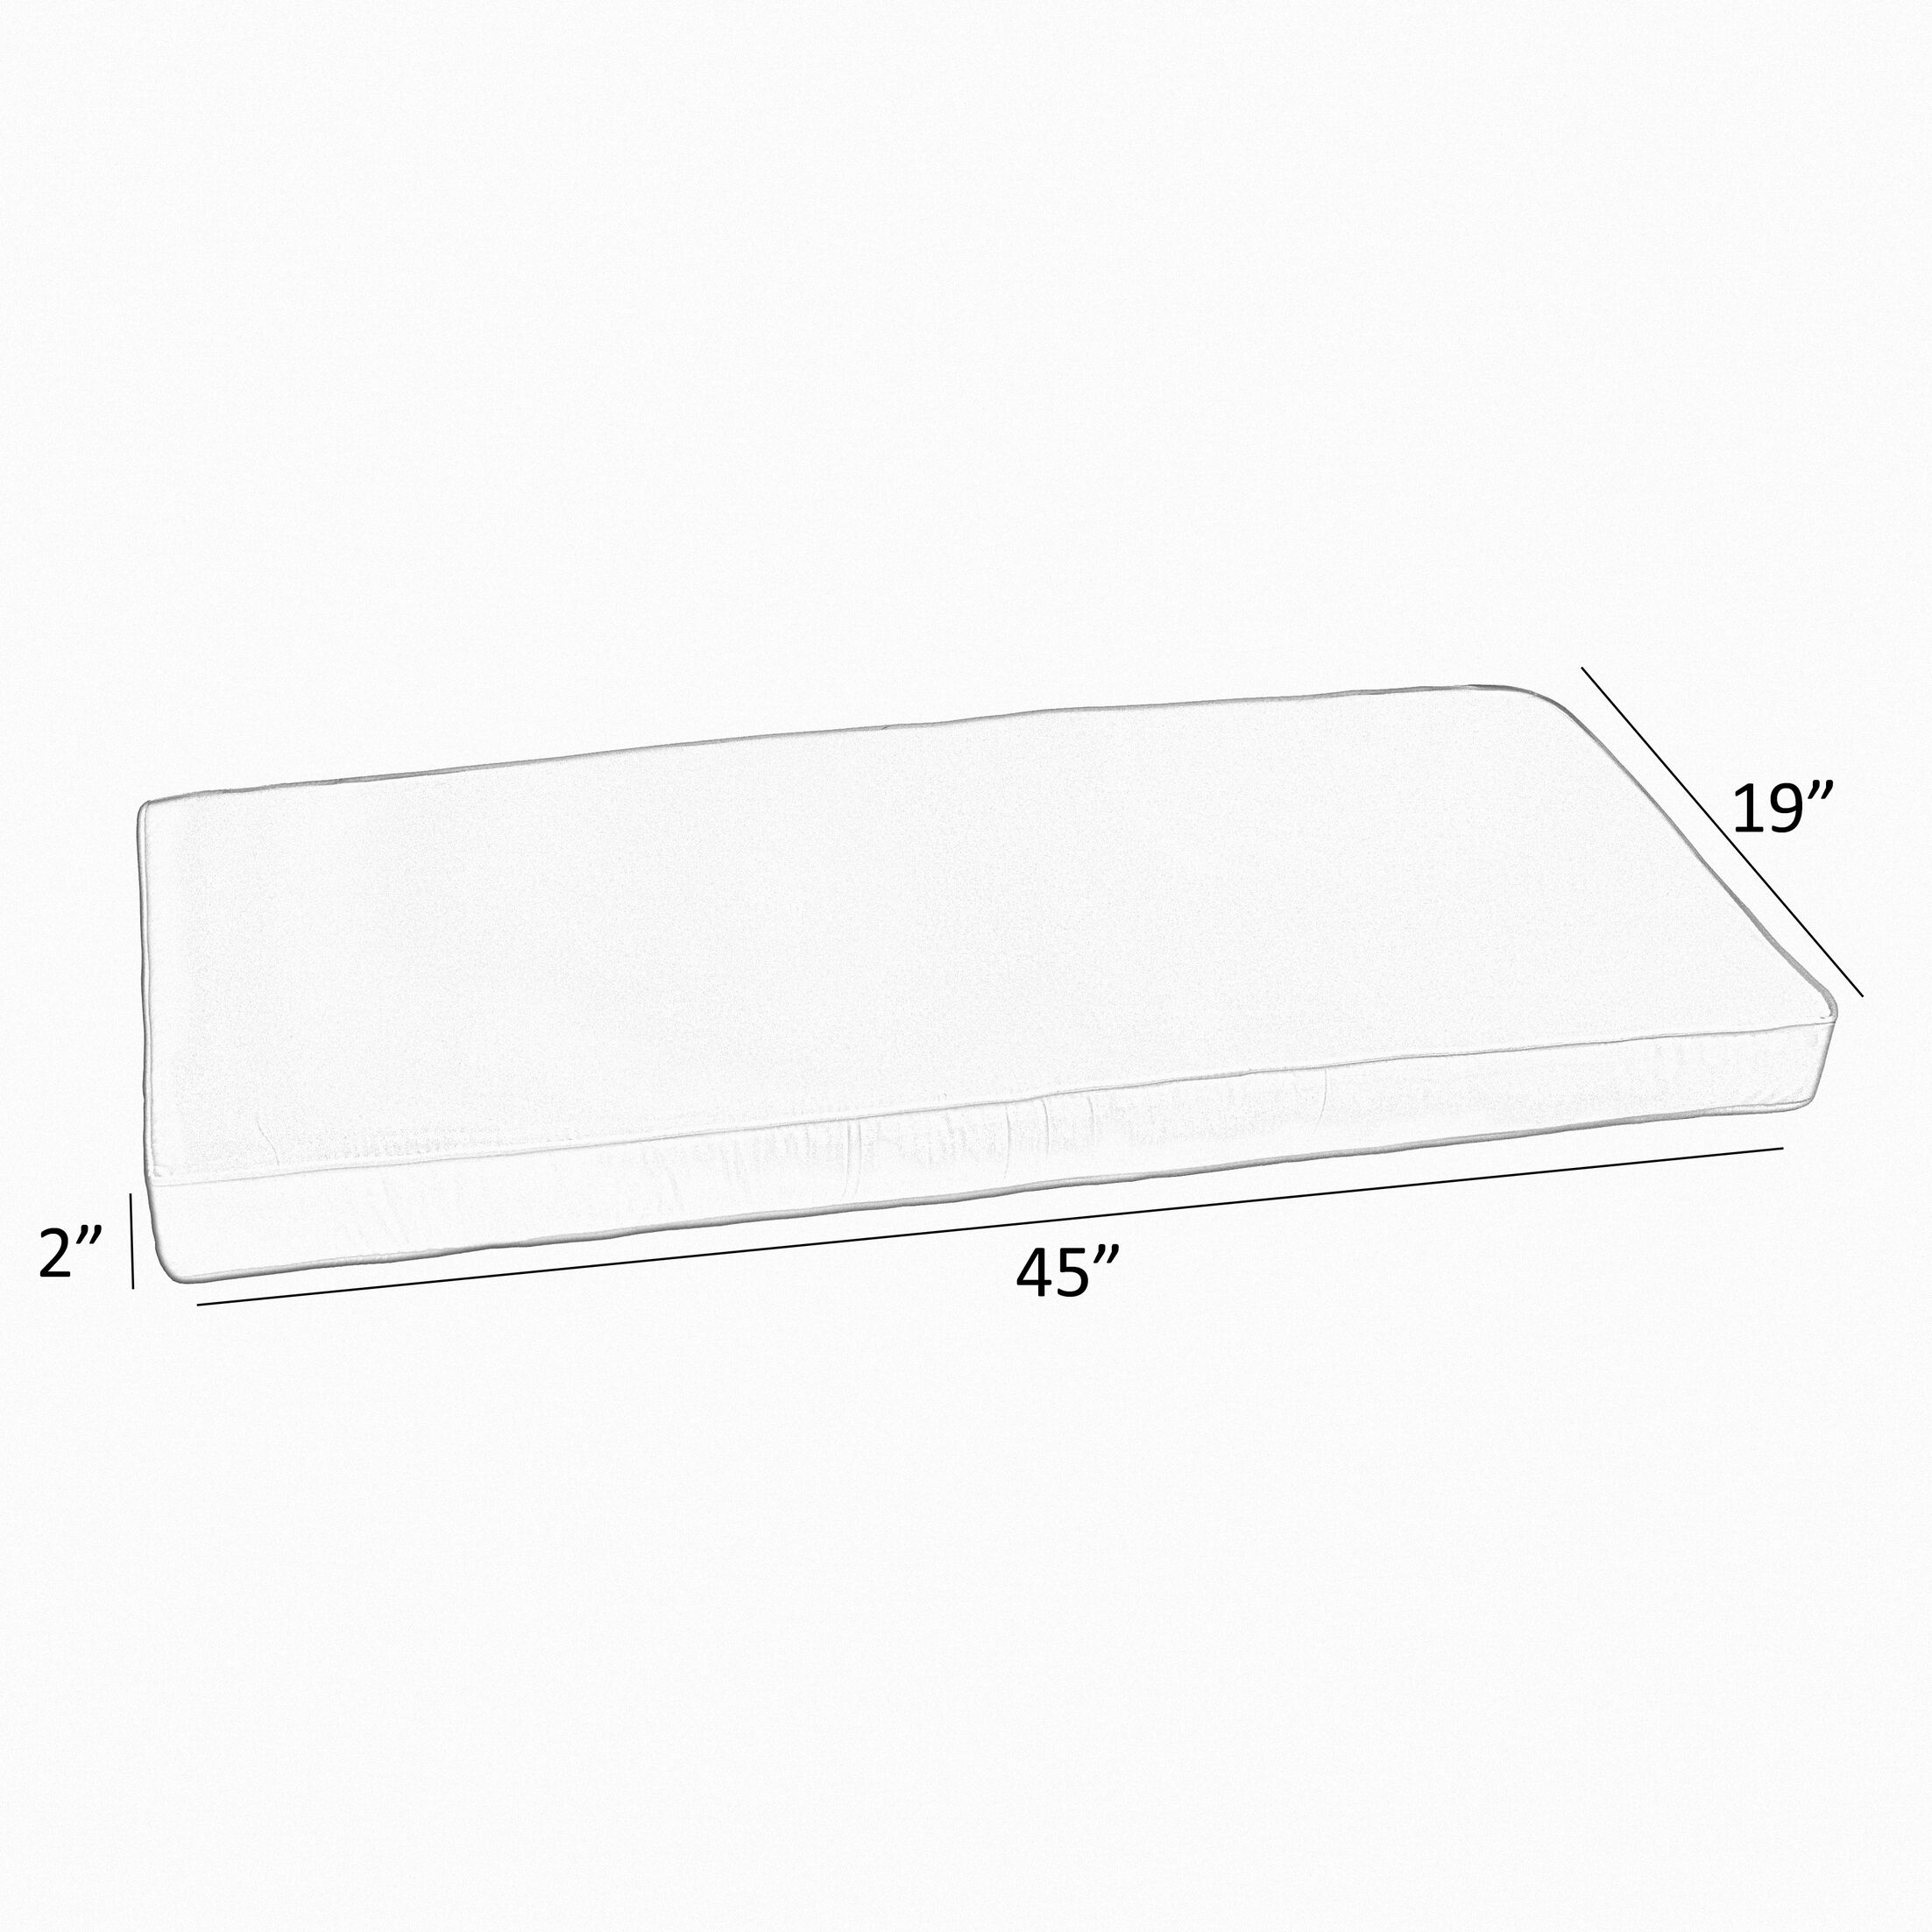 Indoor/Outdoor Sunbrella Bench Cushion Size: 45